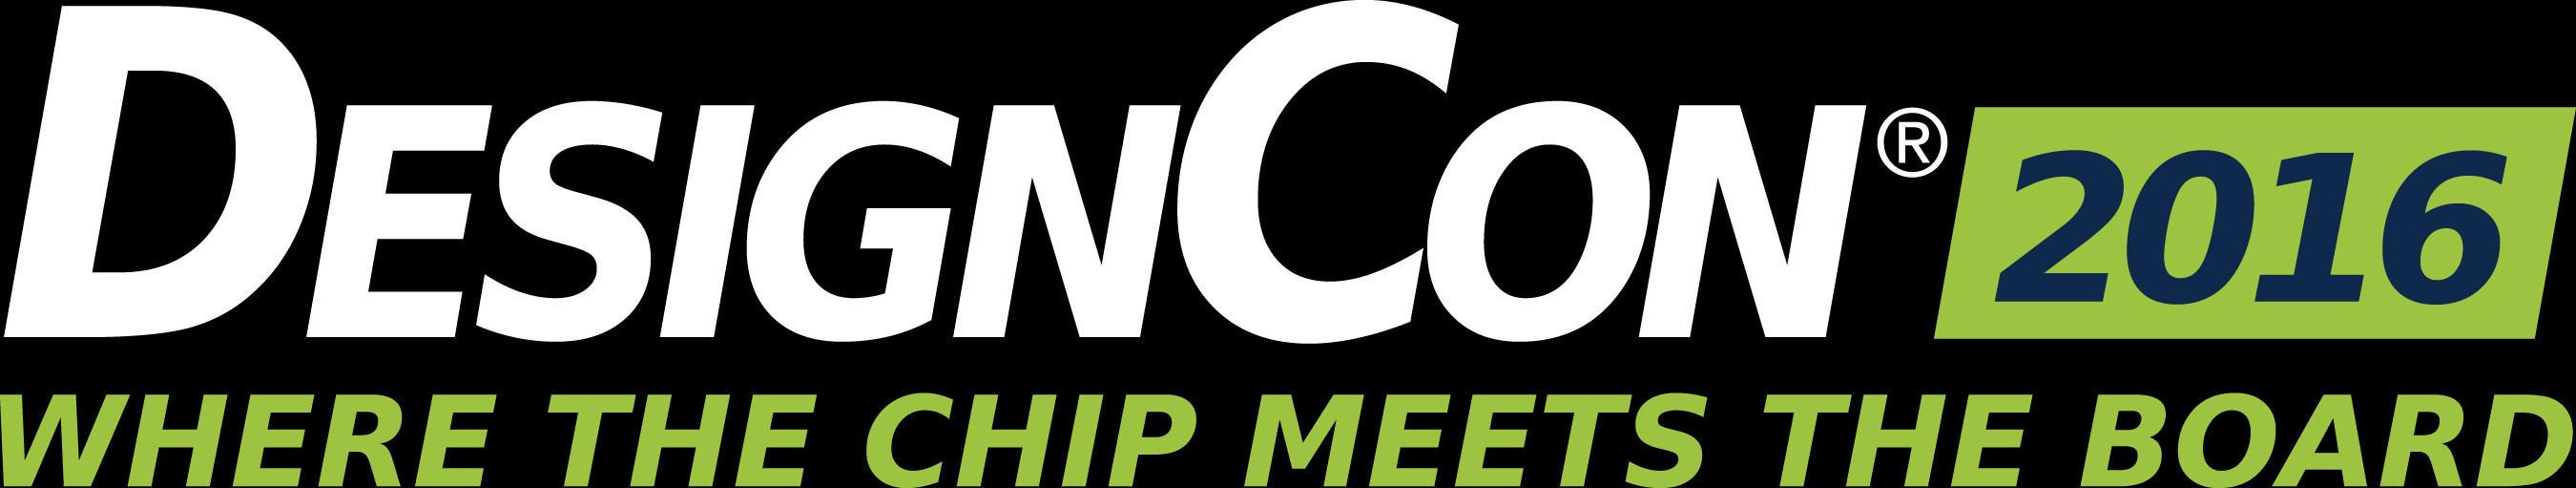 DesignCon will take place January 19-21 at the Santa Clara Convention Center.